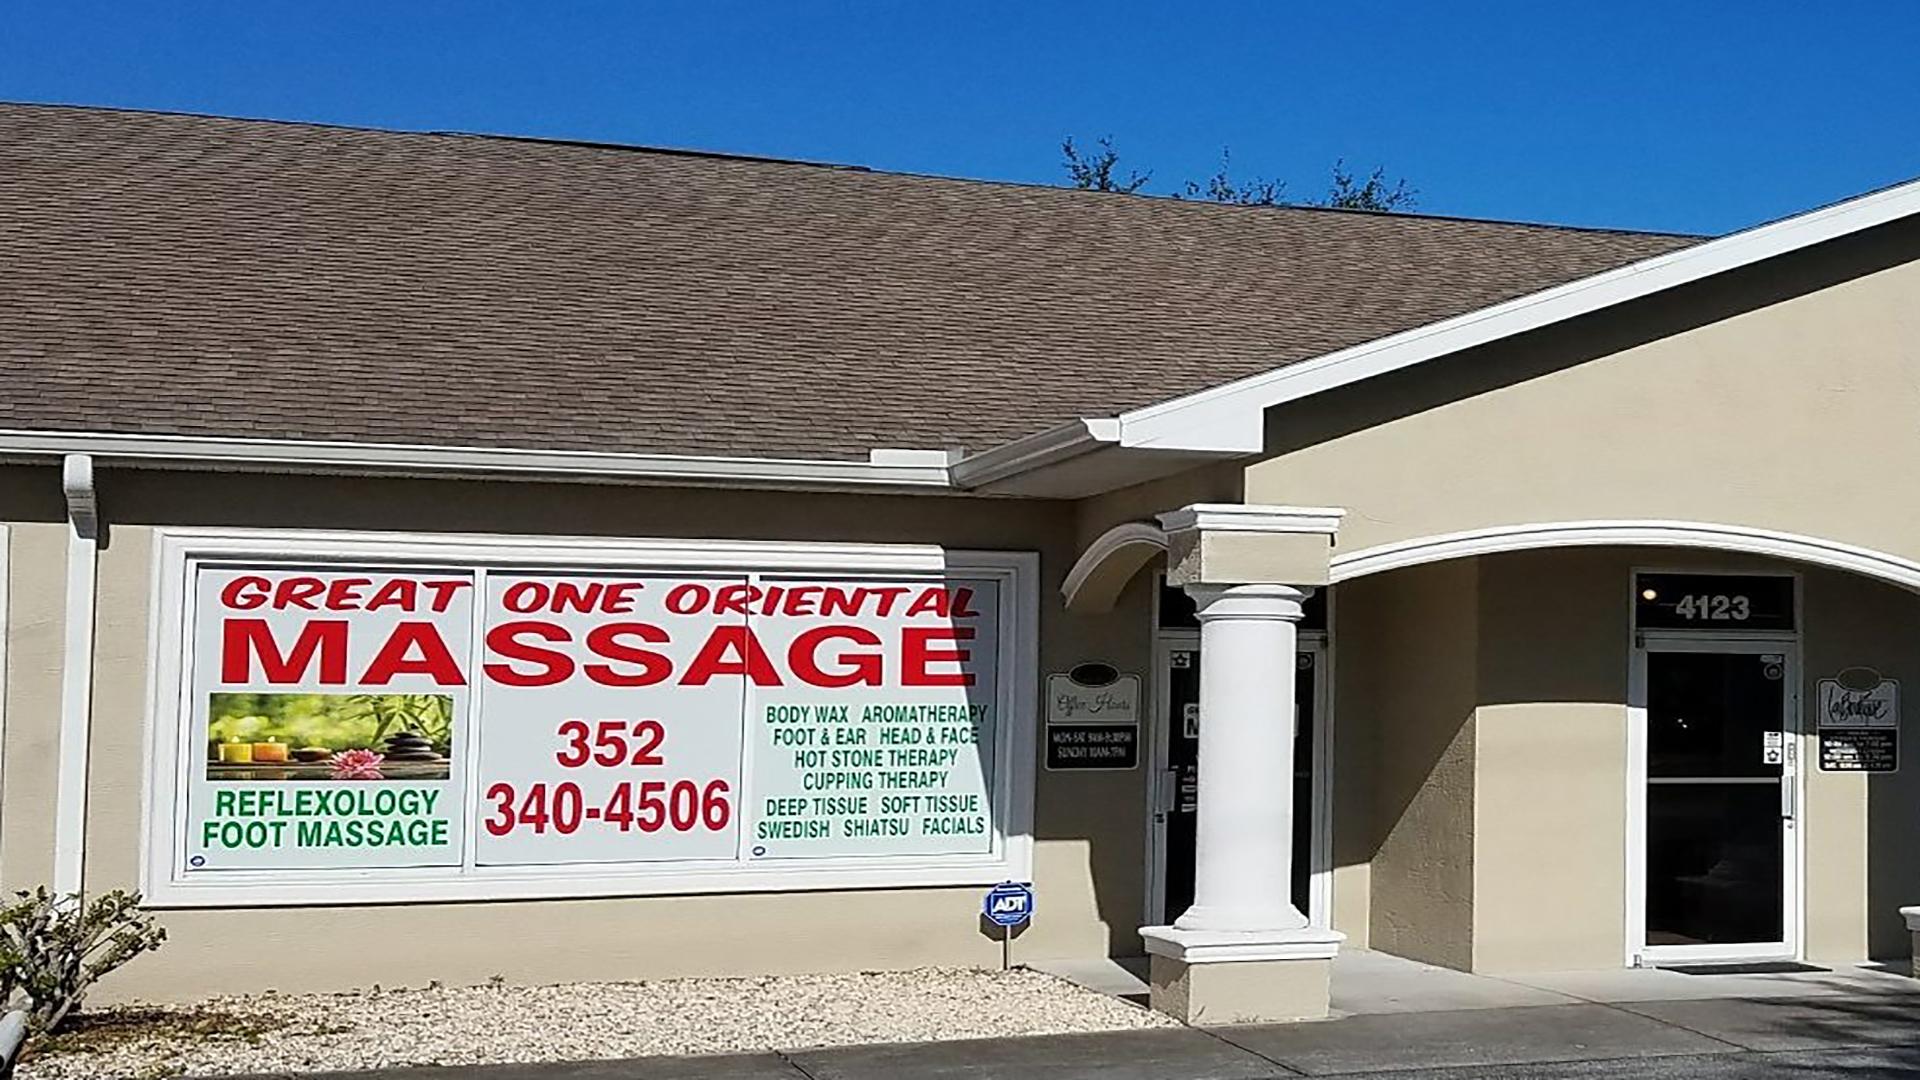 Asian massage parlor tampa